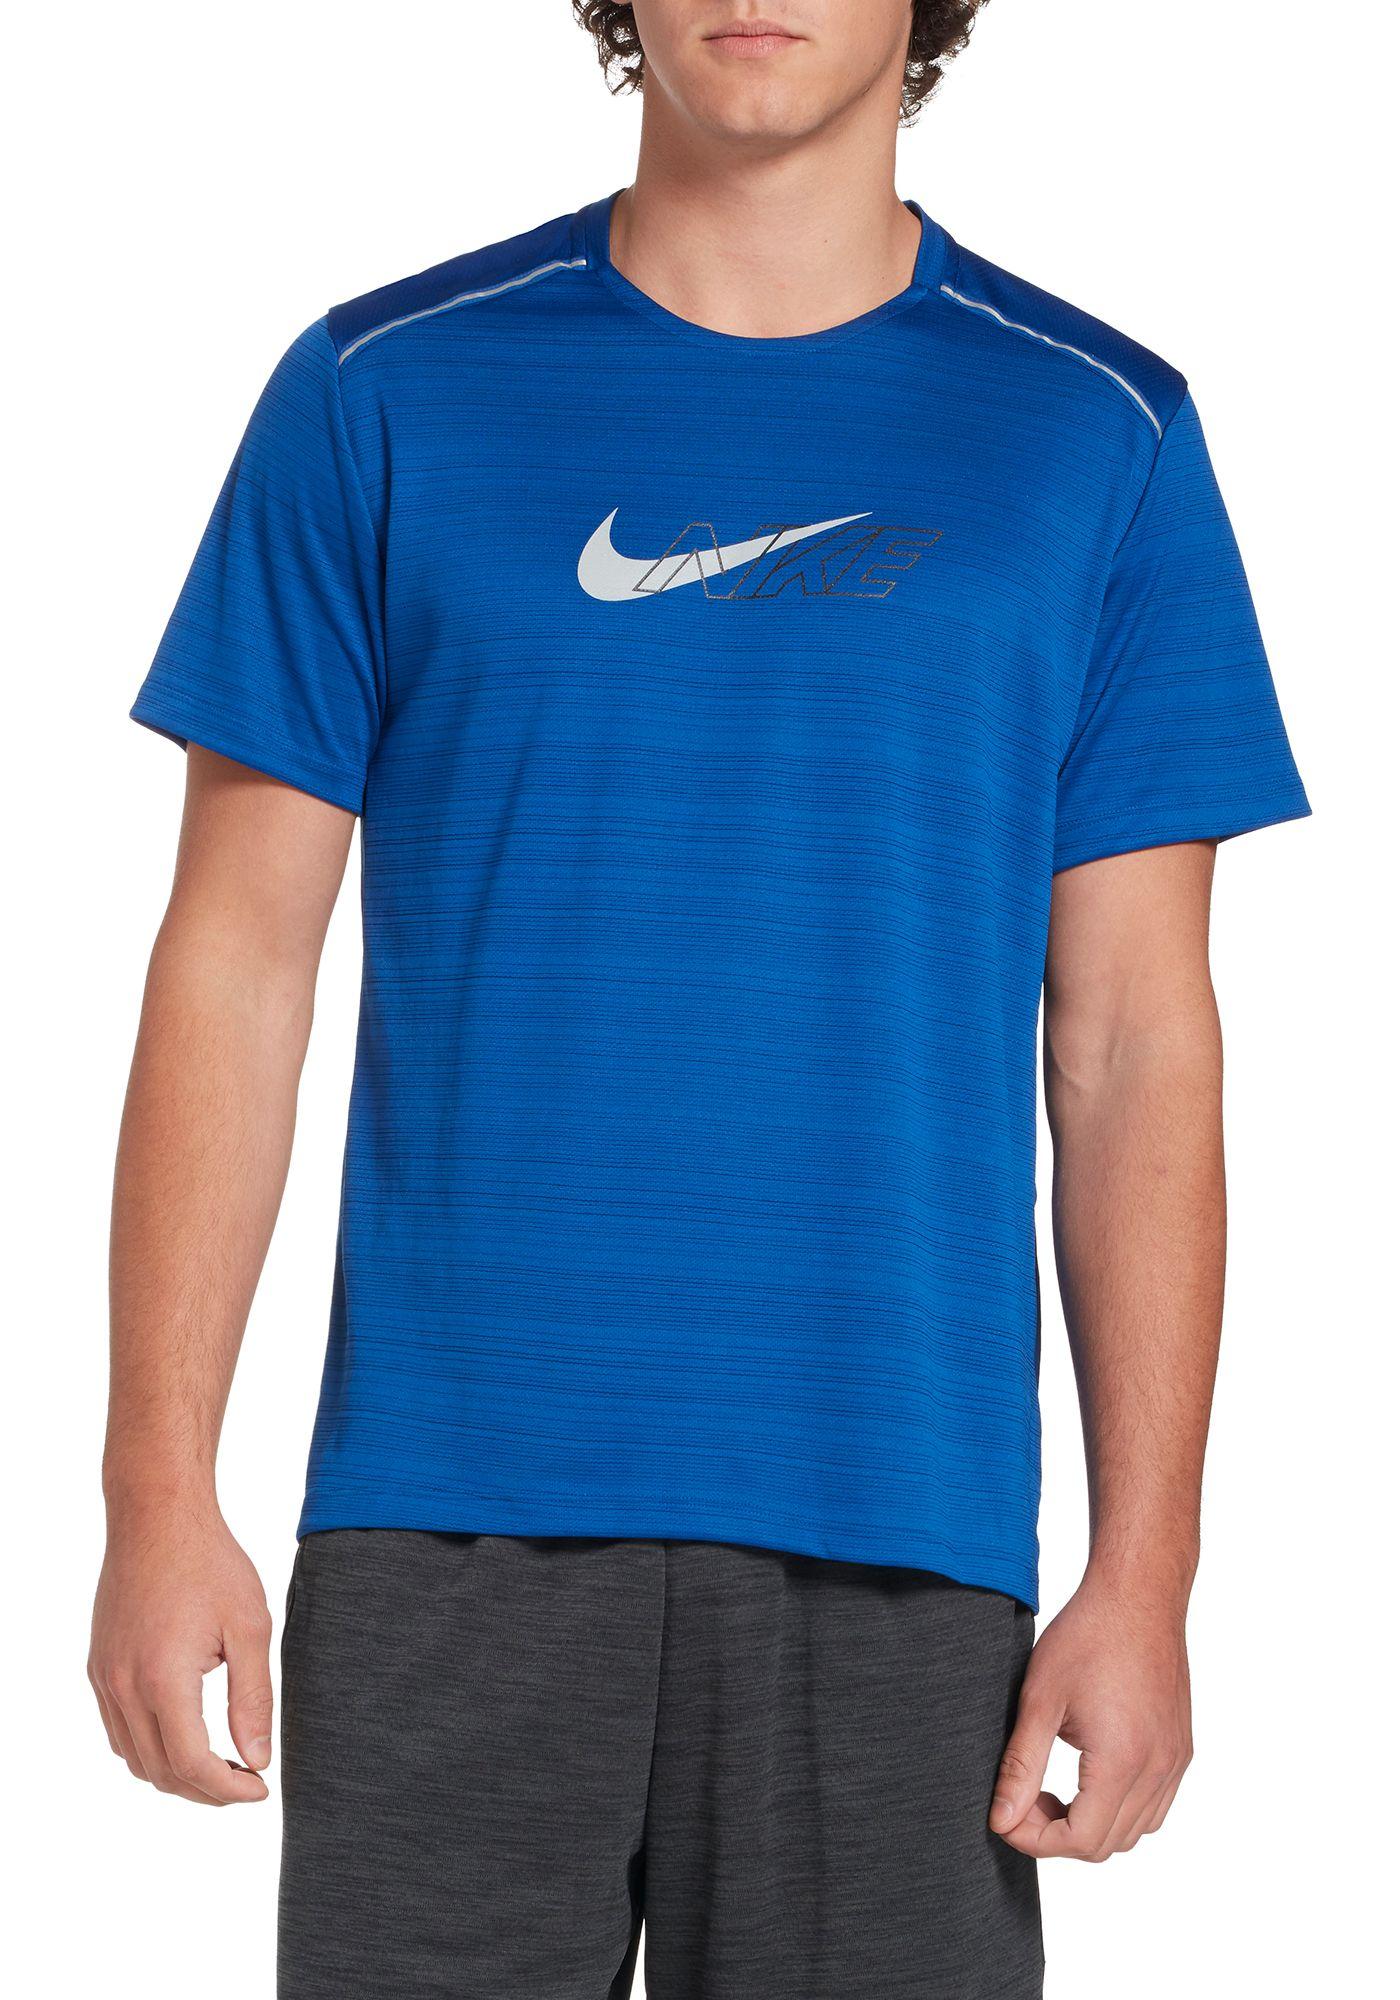 Nike Men's Dri-FIT Miler Short Sleeve Running Top